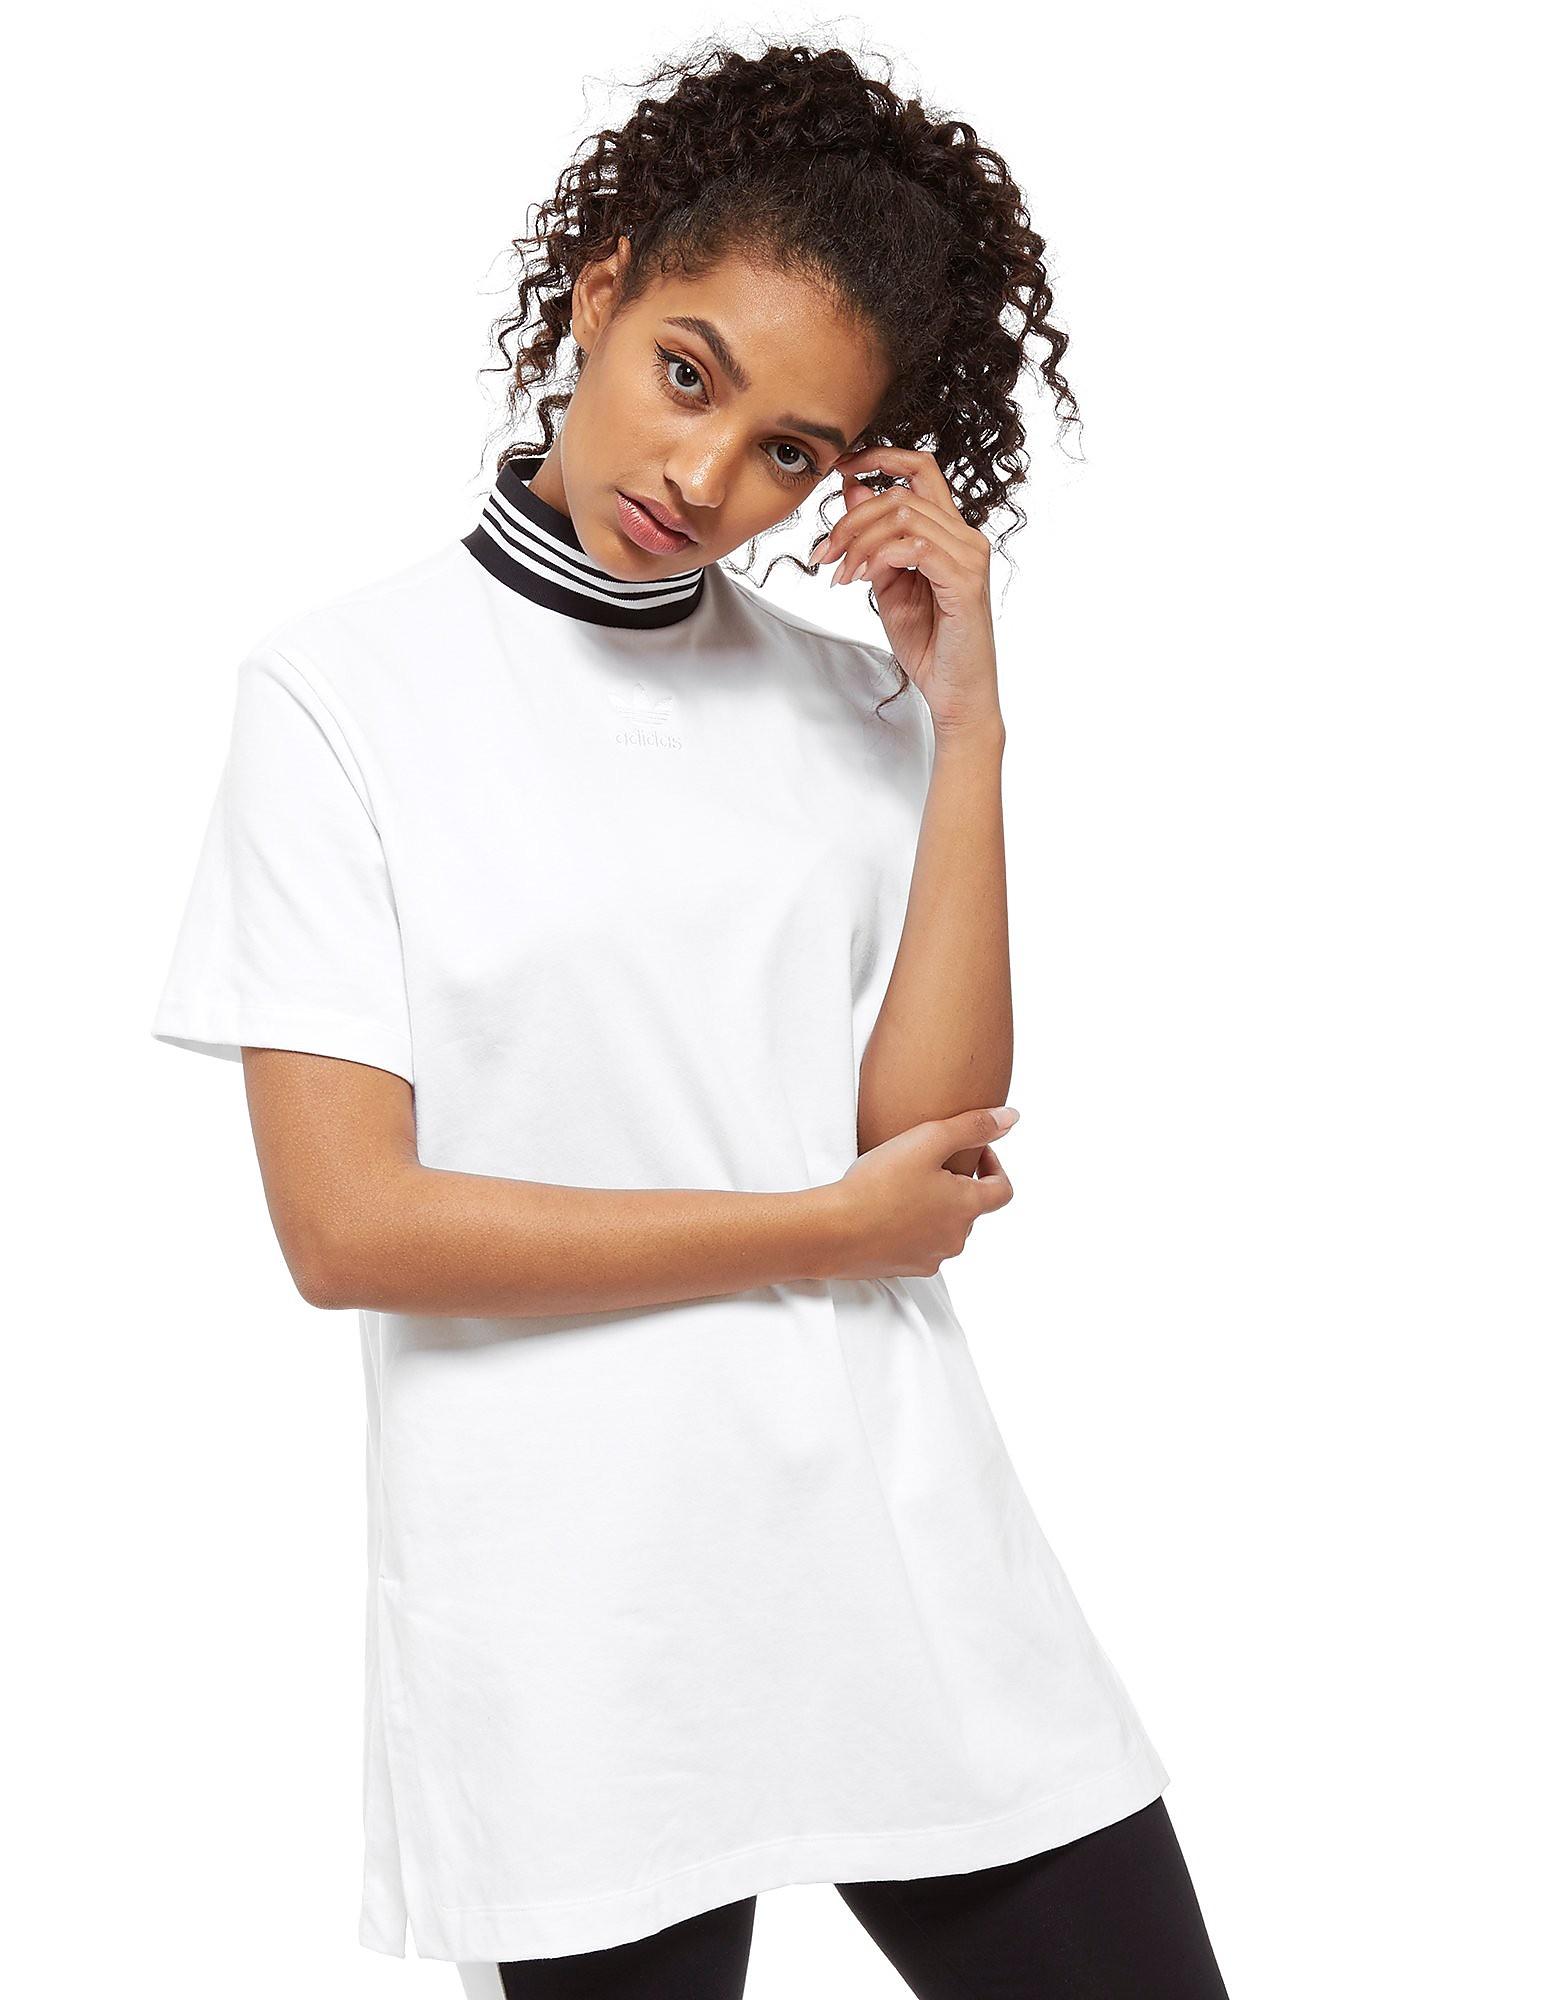 adidas Originals Robe T-Shirt Femme - White/Black, White/Black